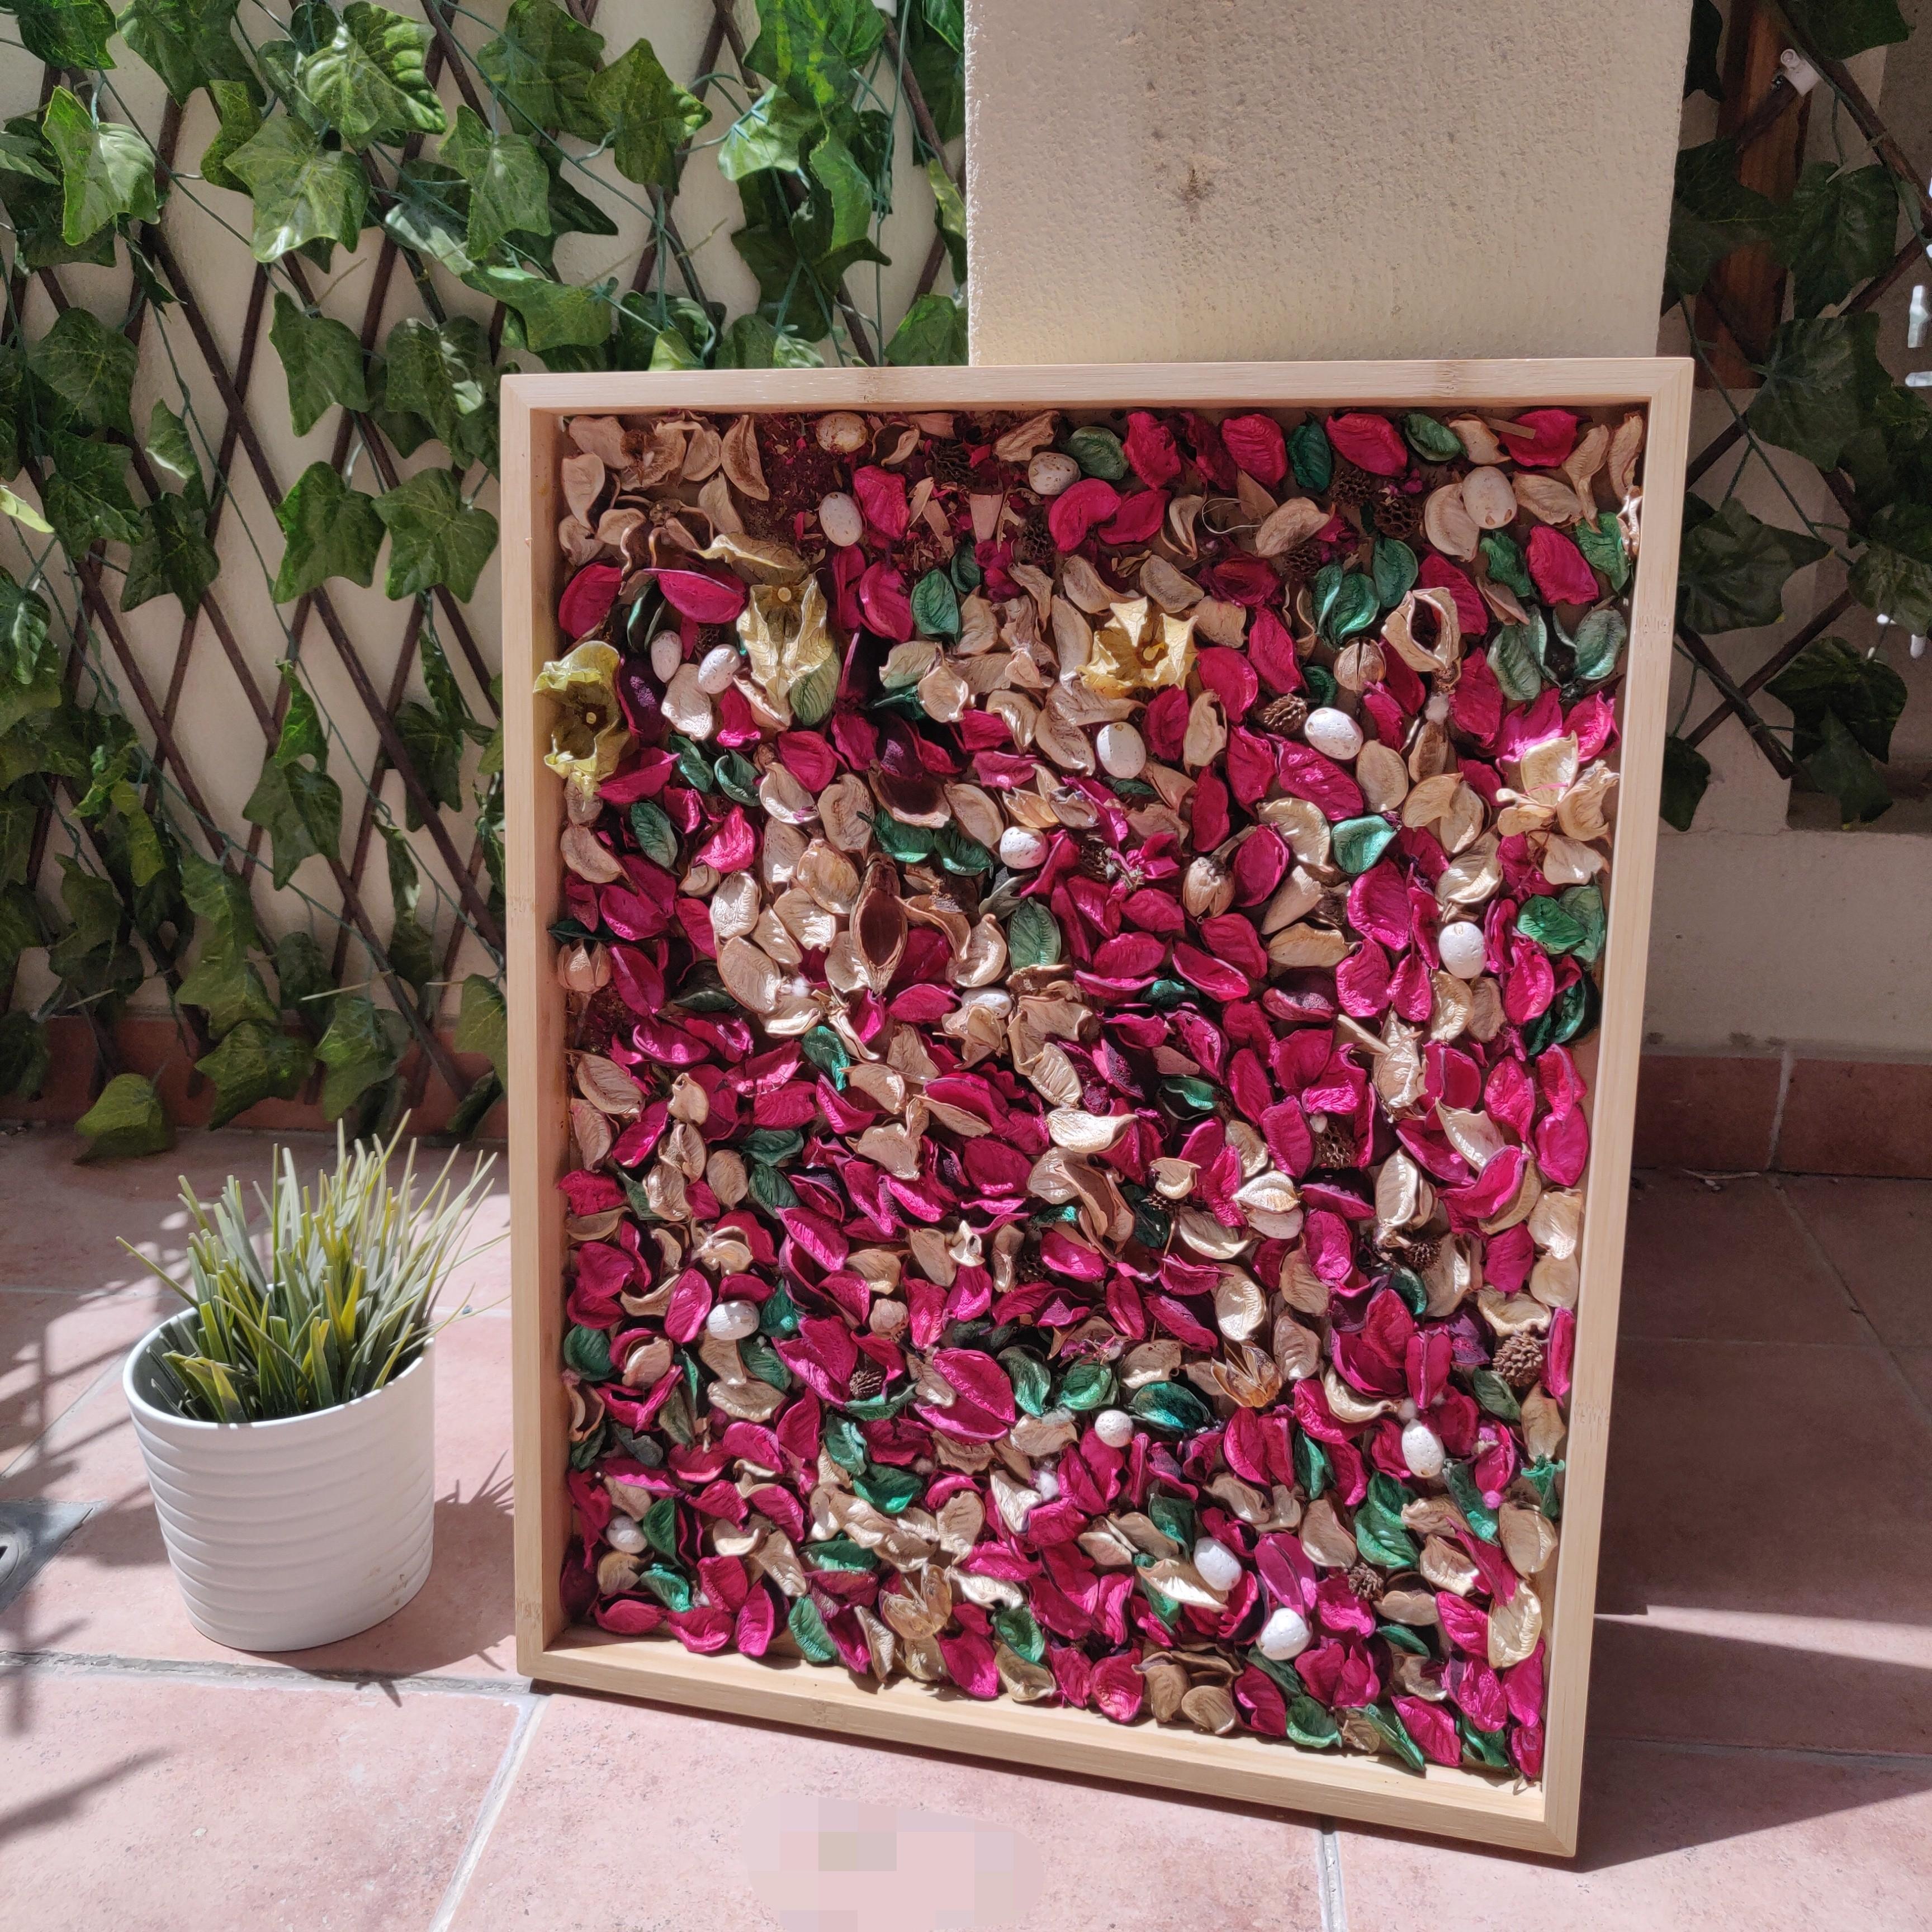 Shocking Pink Rustic Potpourri Wall Frame (Vertical or Horizontal mounted)